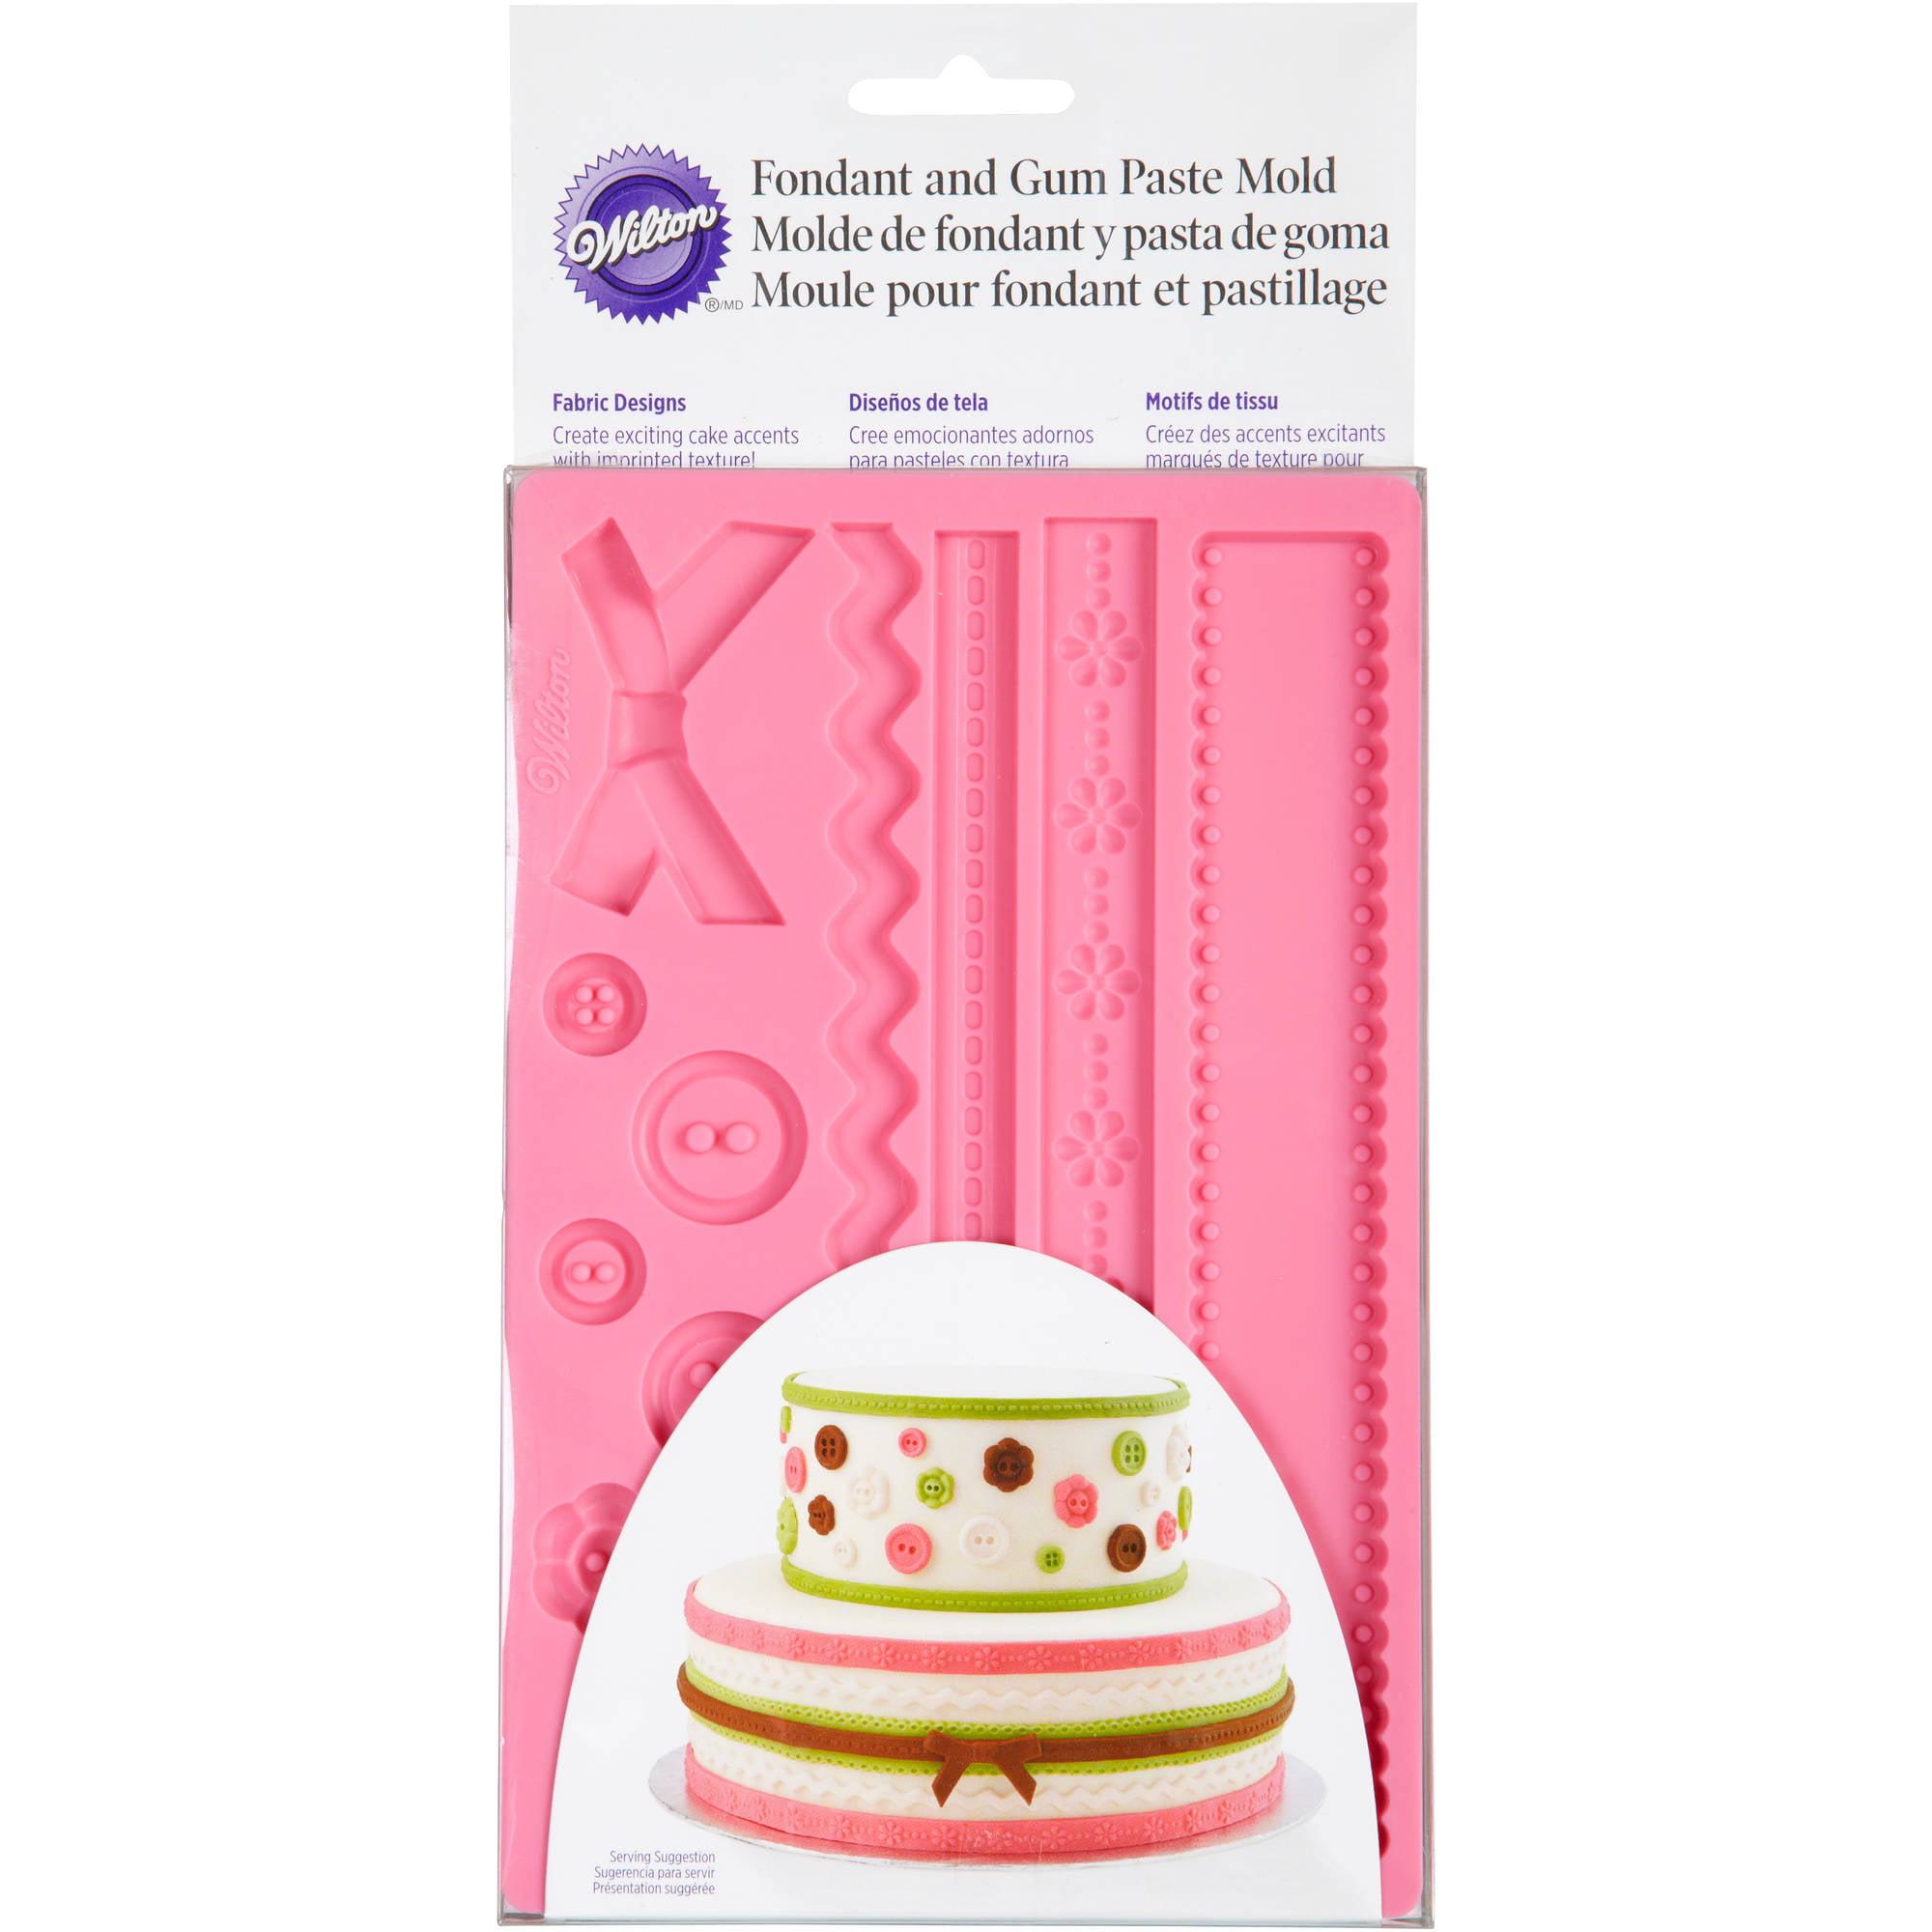 Wilton Fondant & Gum Paste Silicone Mold, Fabric Designs by Wilton